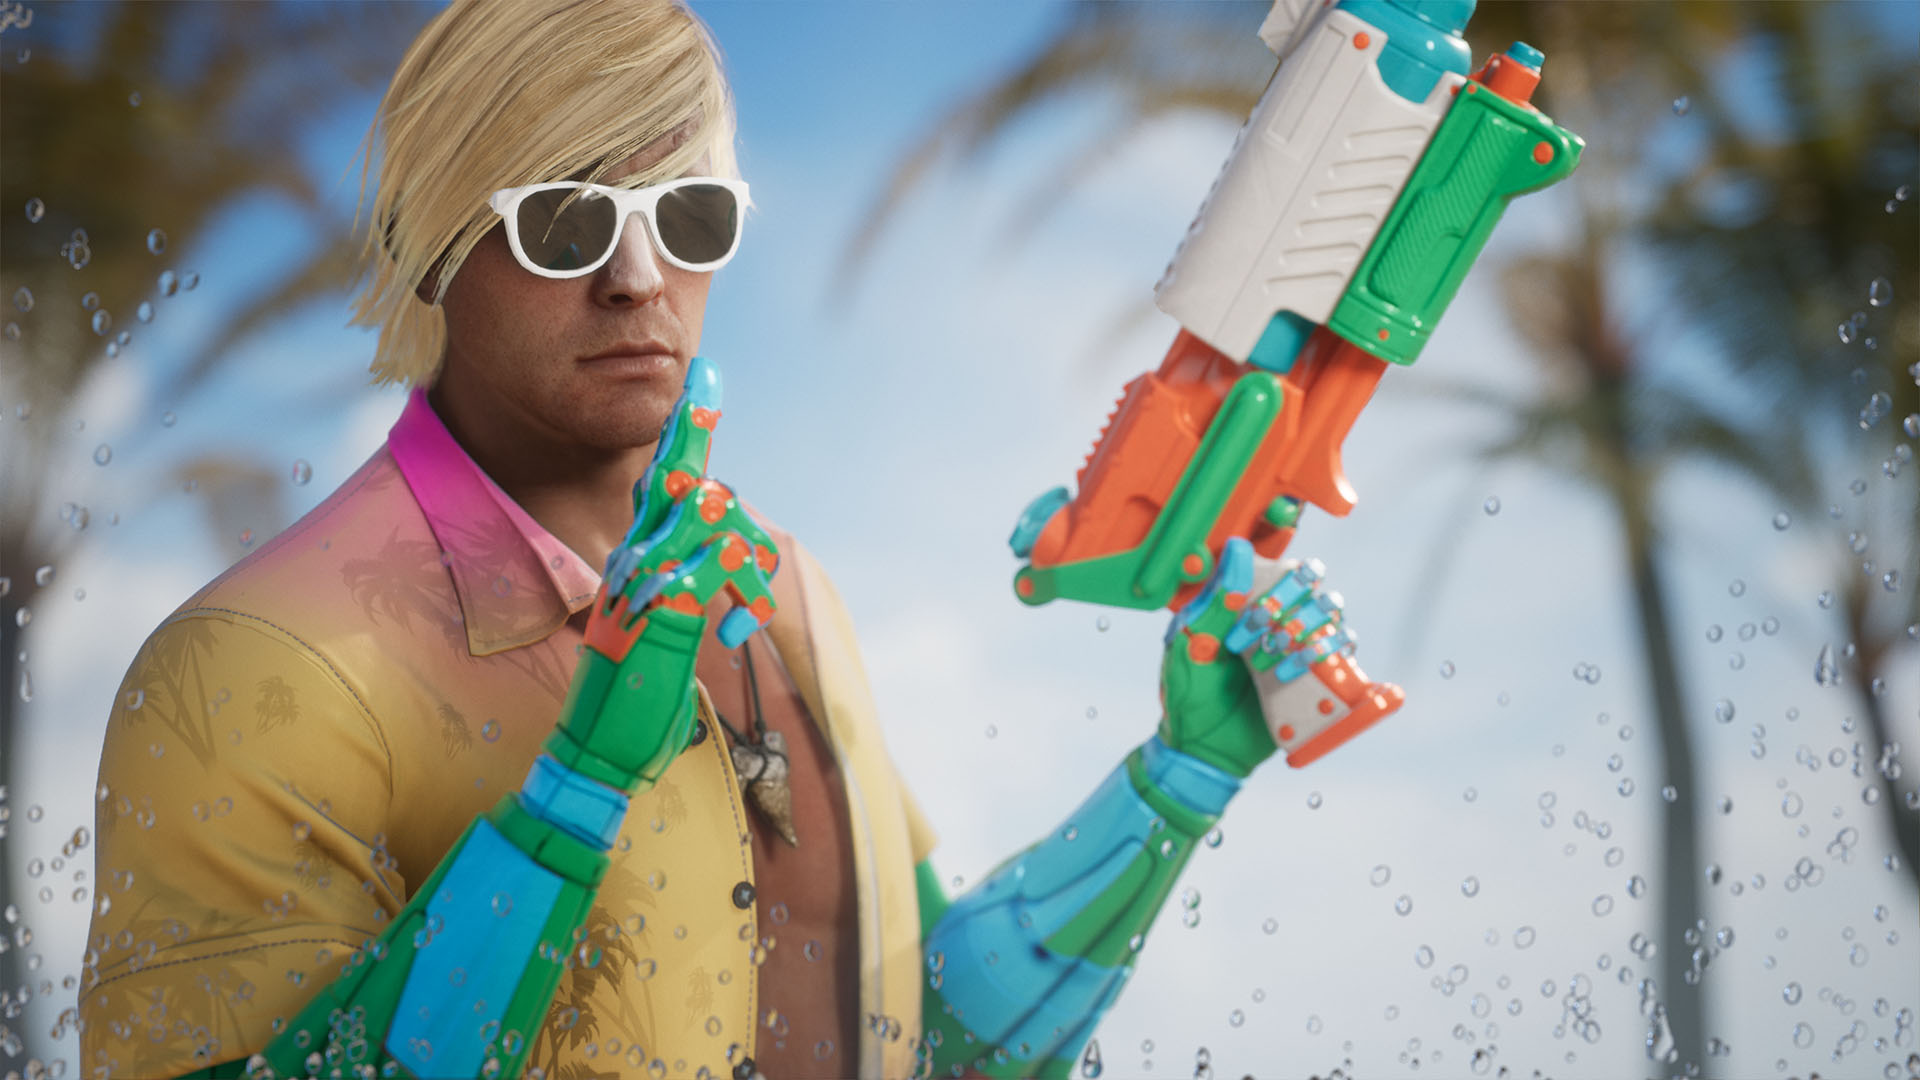 V.41.4 Store Update - Summer Fun Twinblast